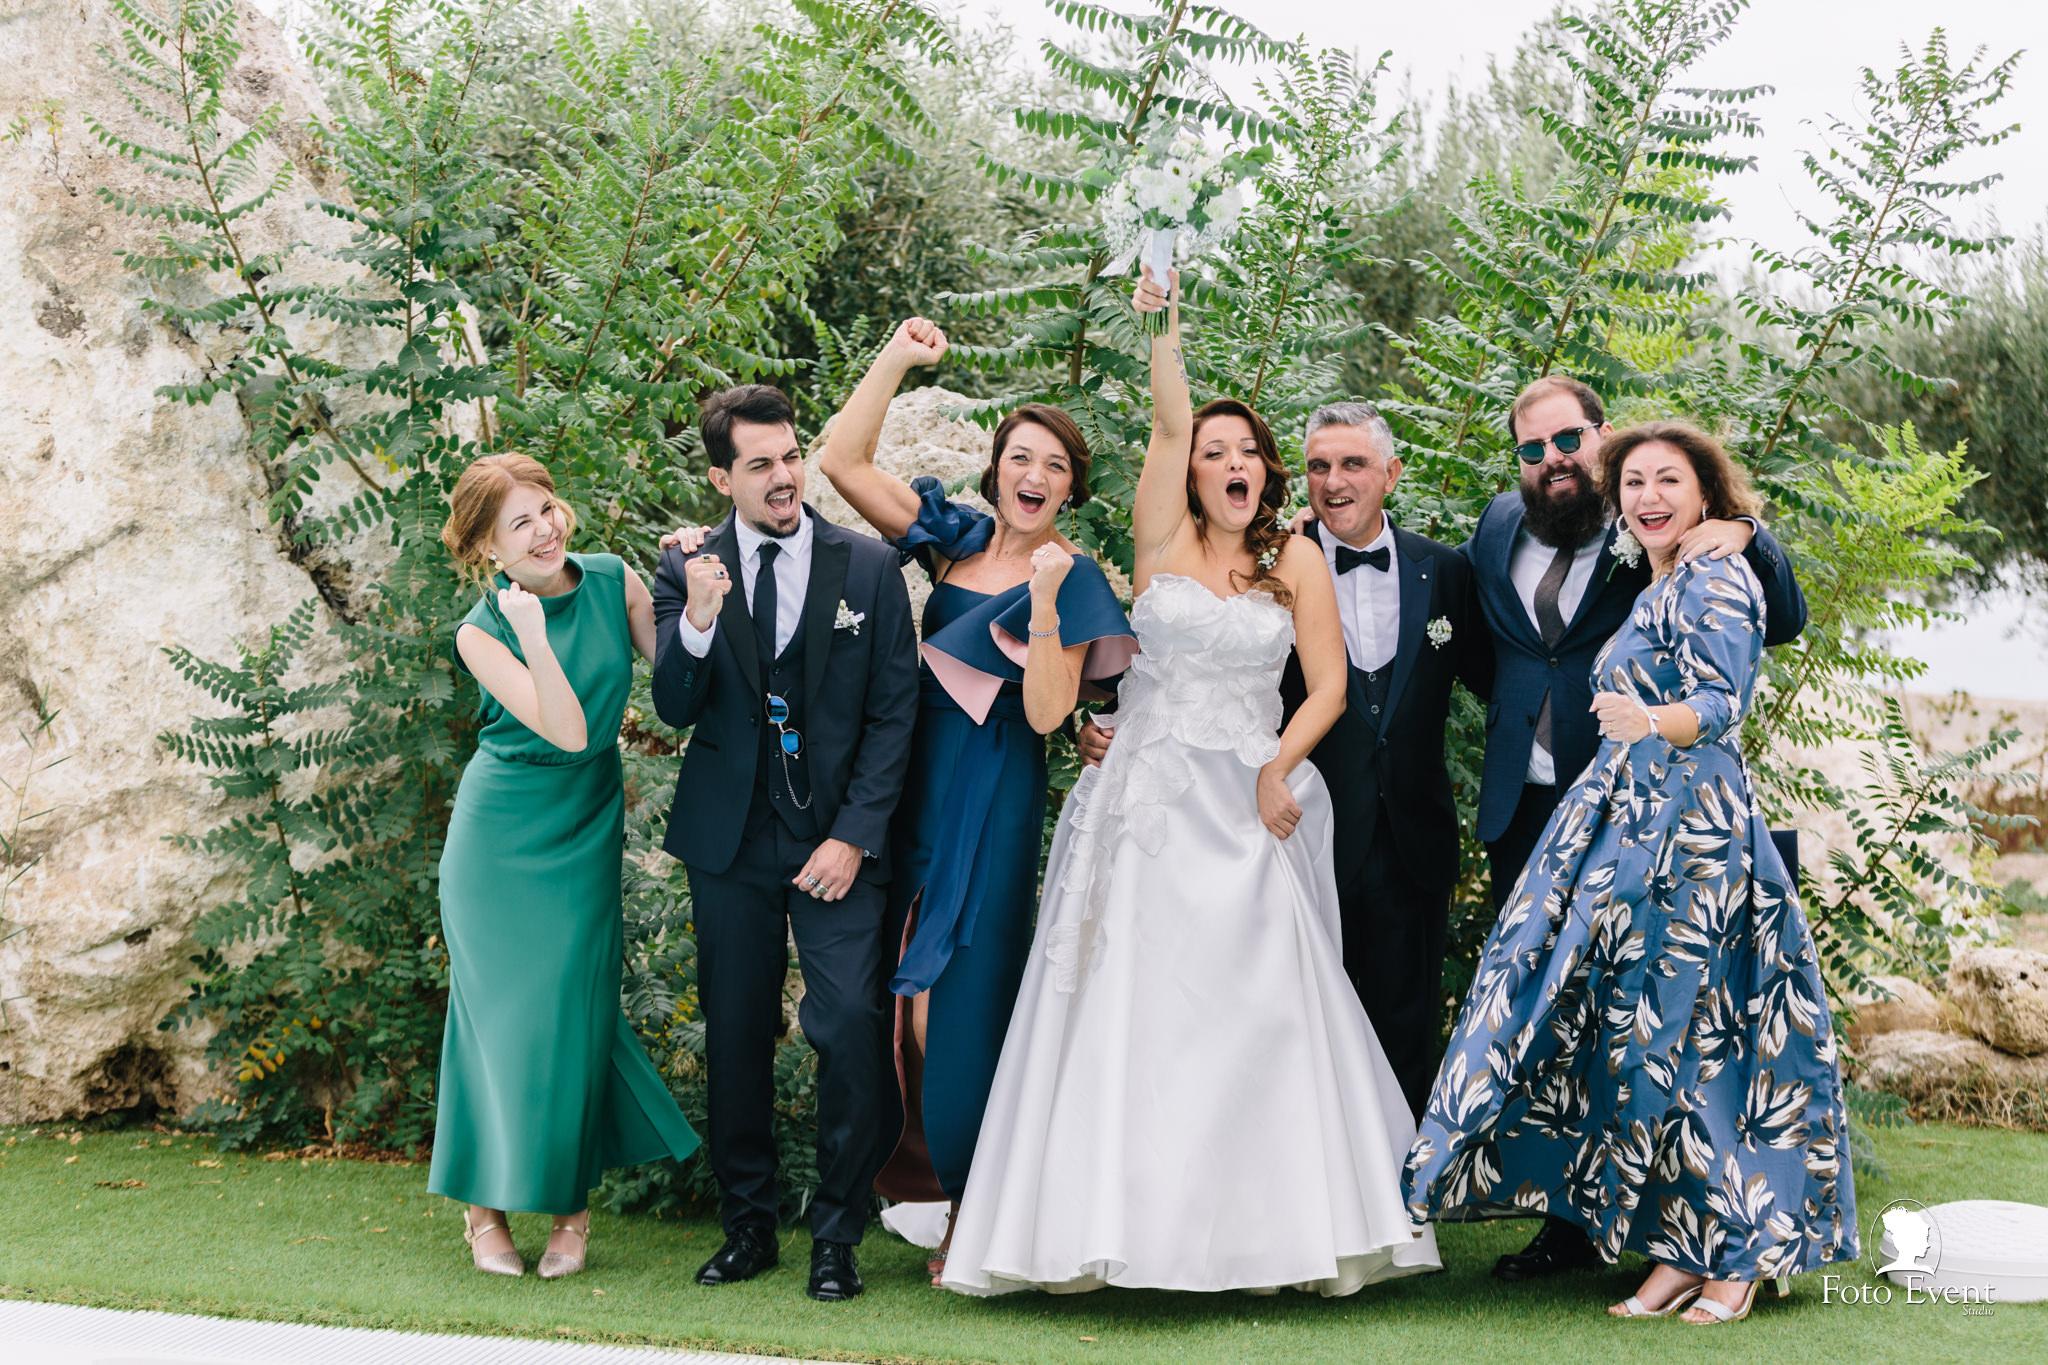 026-2020-10-15-Matrimonio-Noemi-e-Salvatore-Paterno-zoom-296-Edit